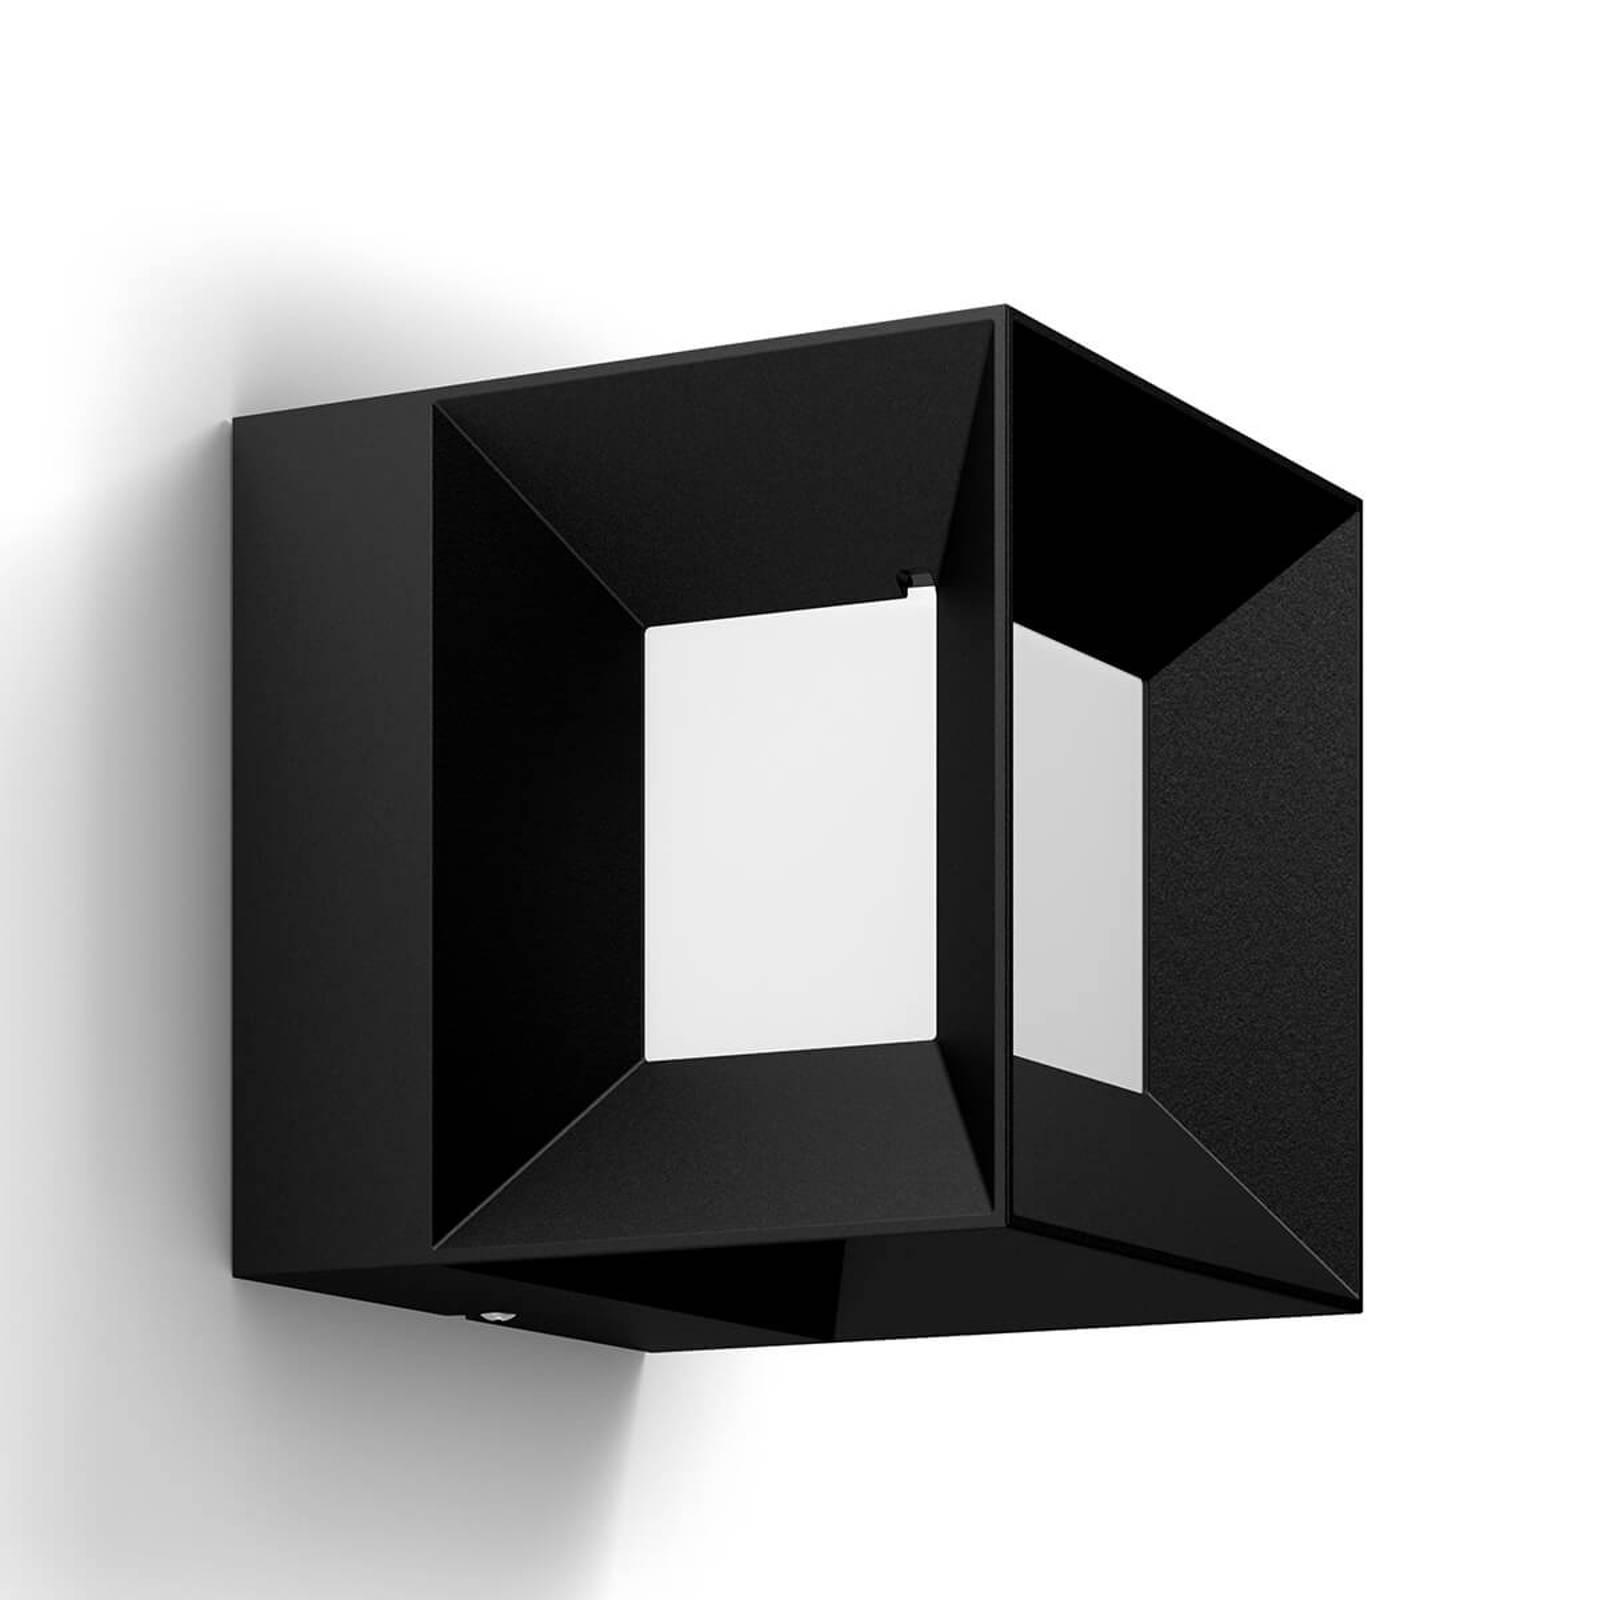 Parterre - dobbelsteenvormige Led-buitenwandlamp